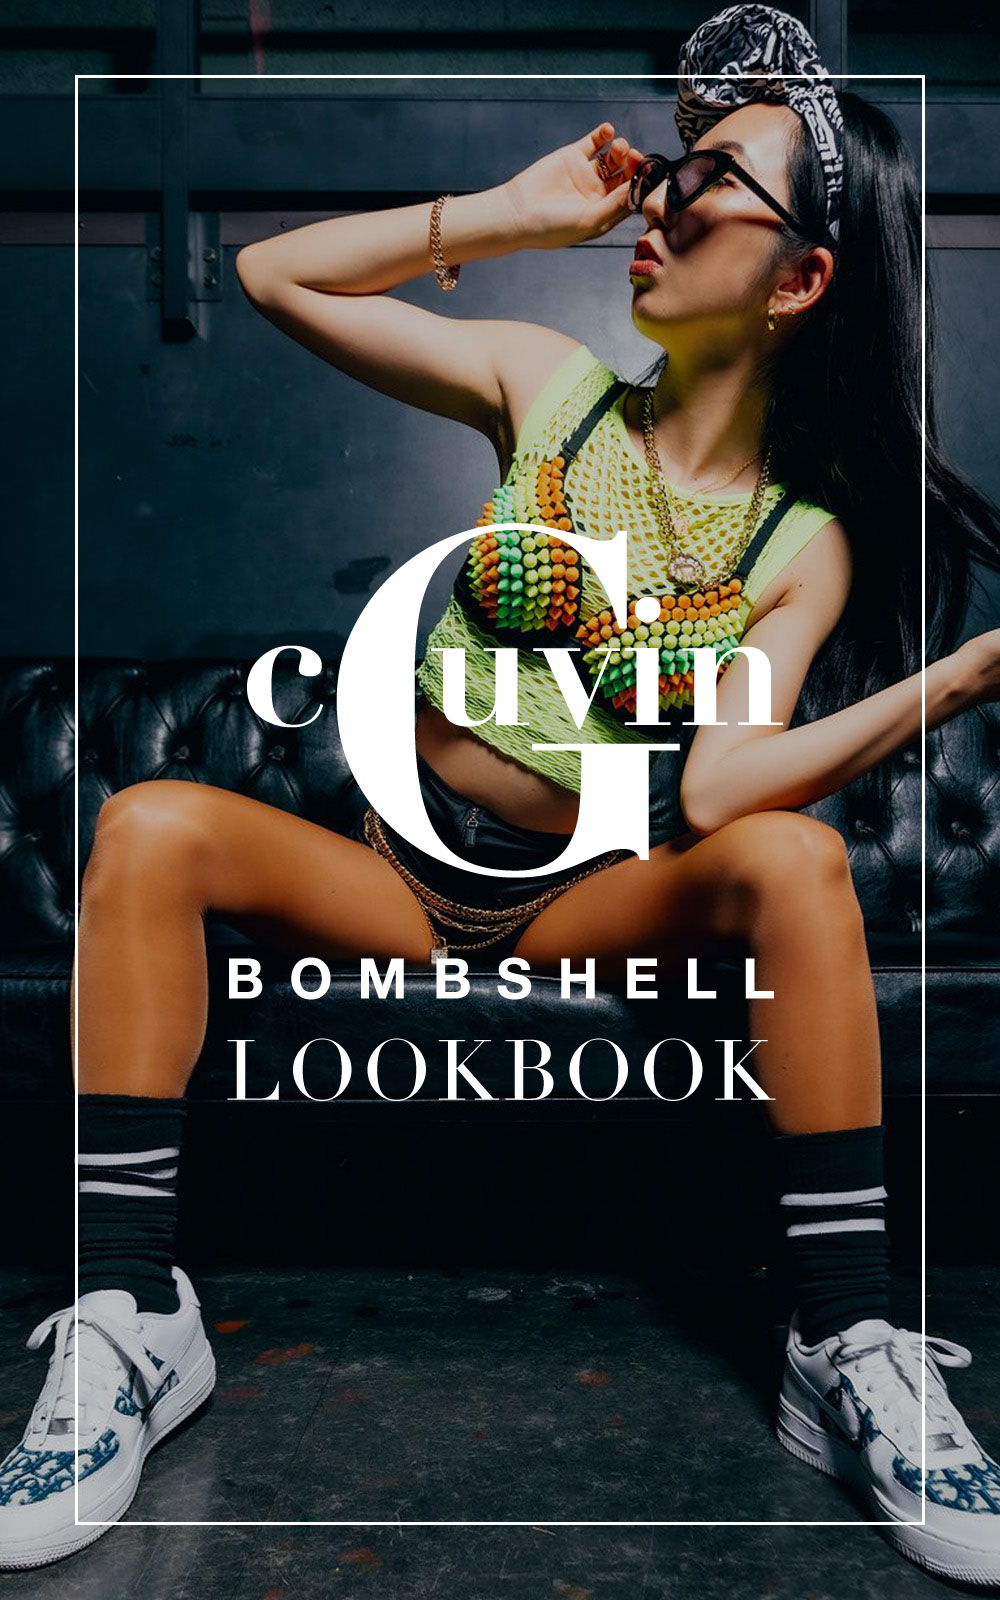 bombshellダンス衣装 ナイトクラブ(nightclub)で輝くダンサー衣装